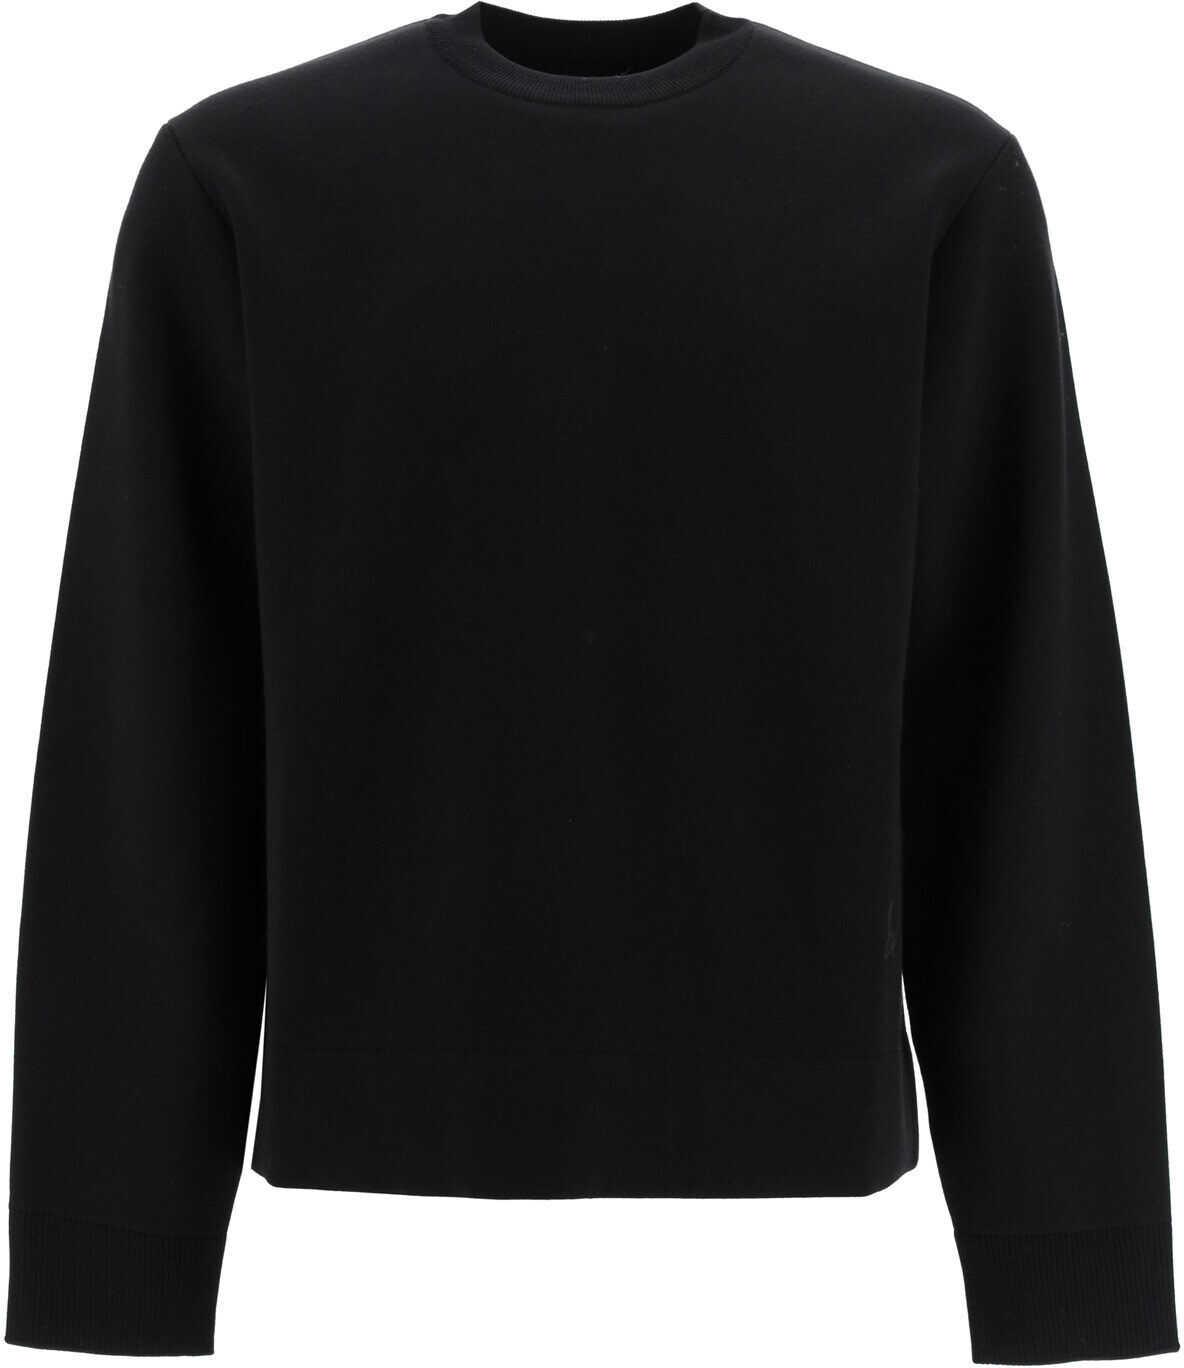 Bottega Veneta Double Crew-Neck Sweater NERO CHOCOLATE imagine